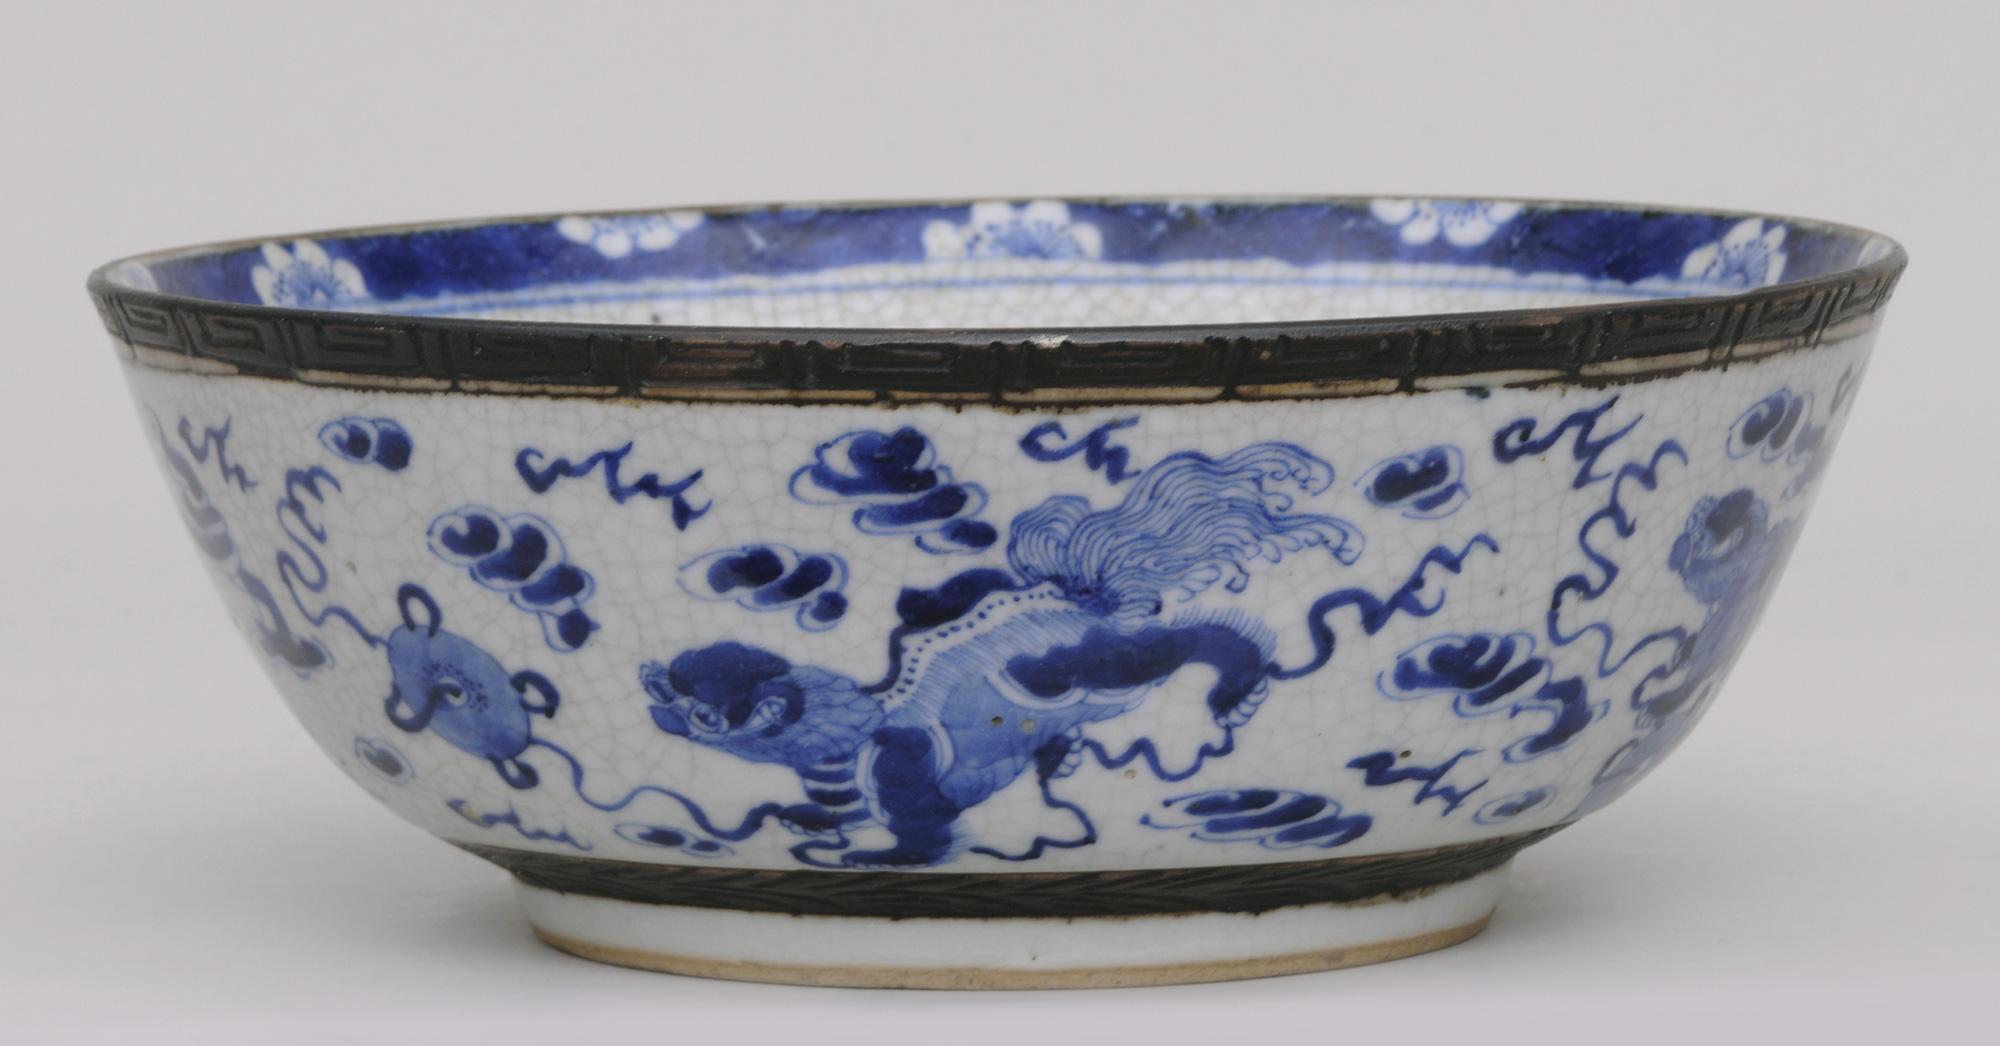 187 Product 187 Chinese Crackle Glaze Bowl